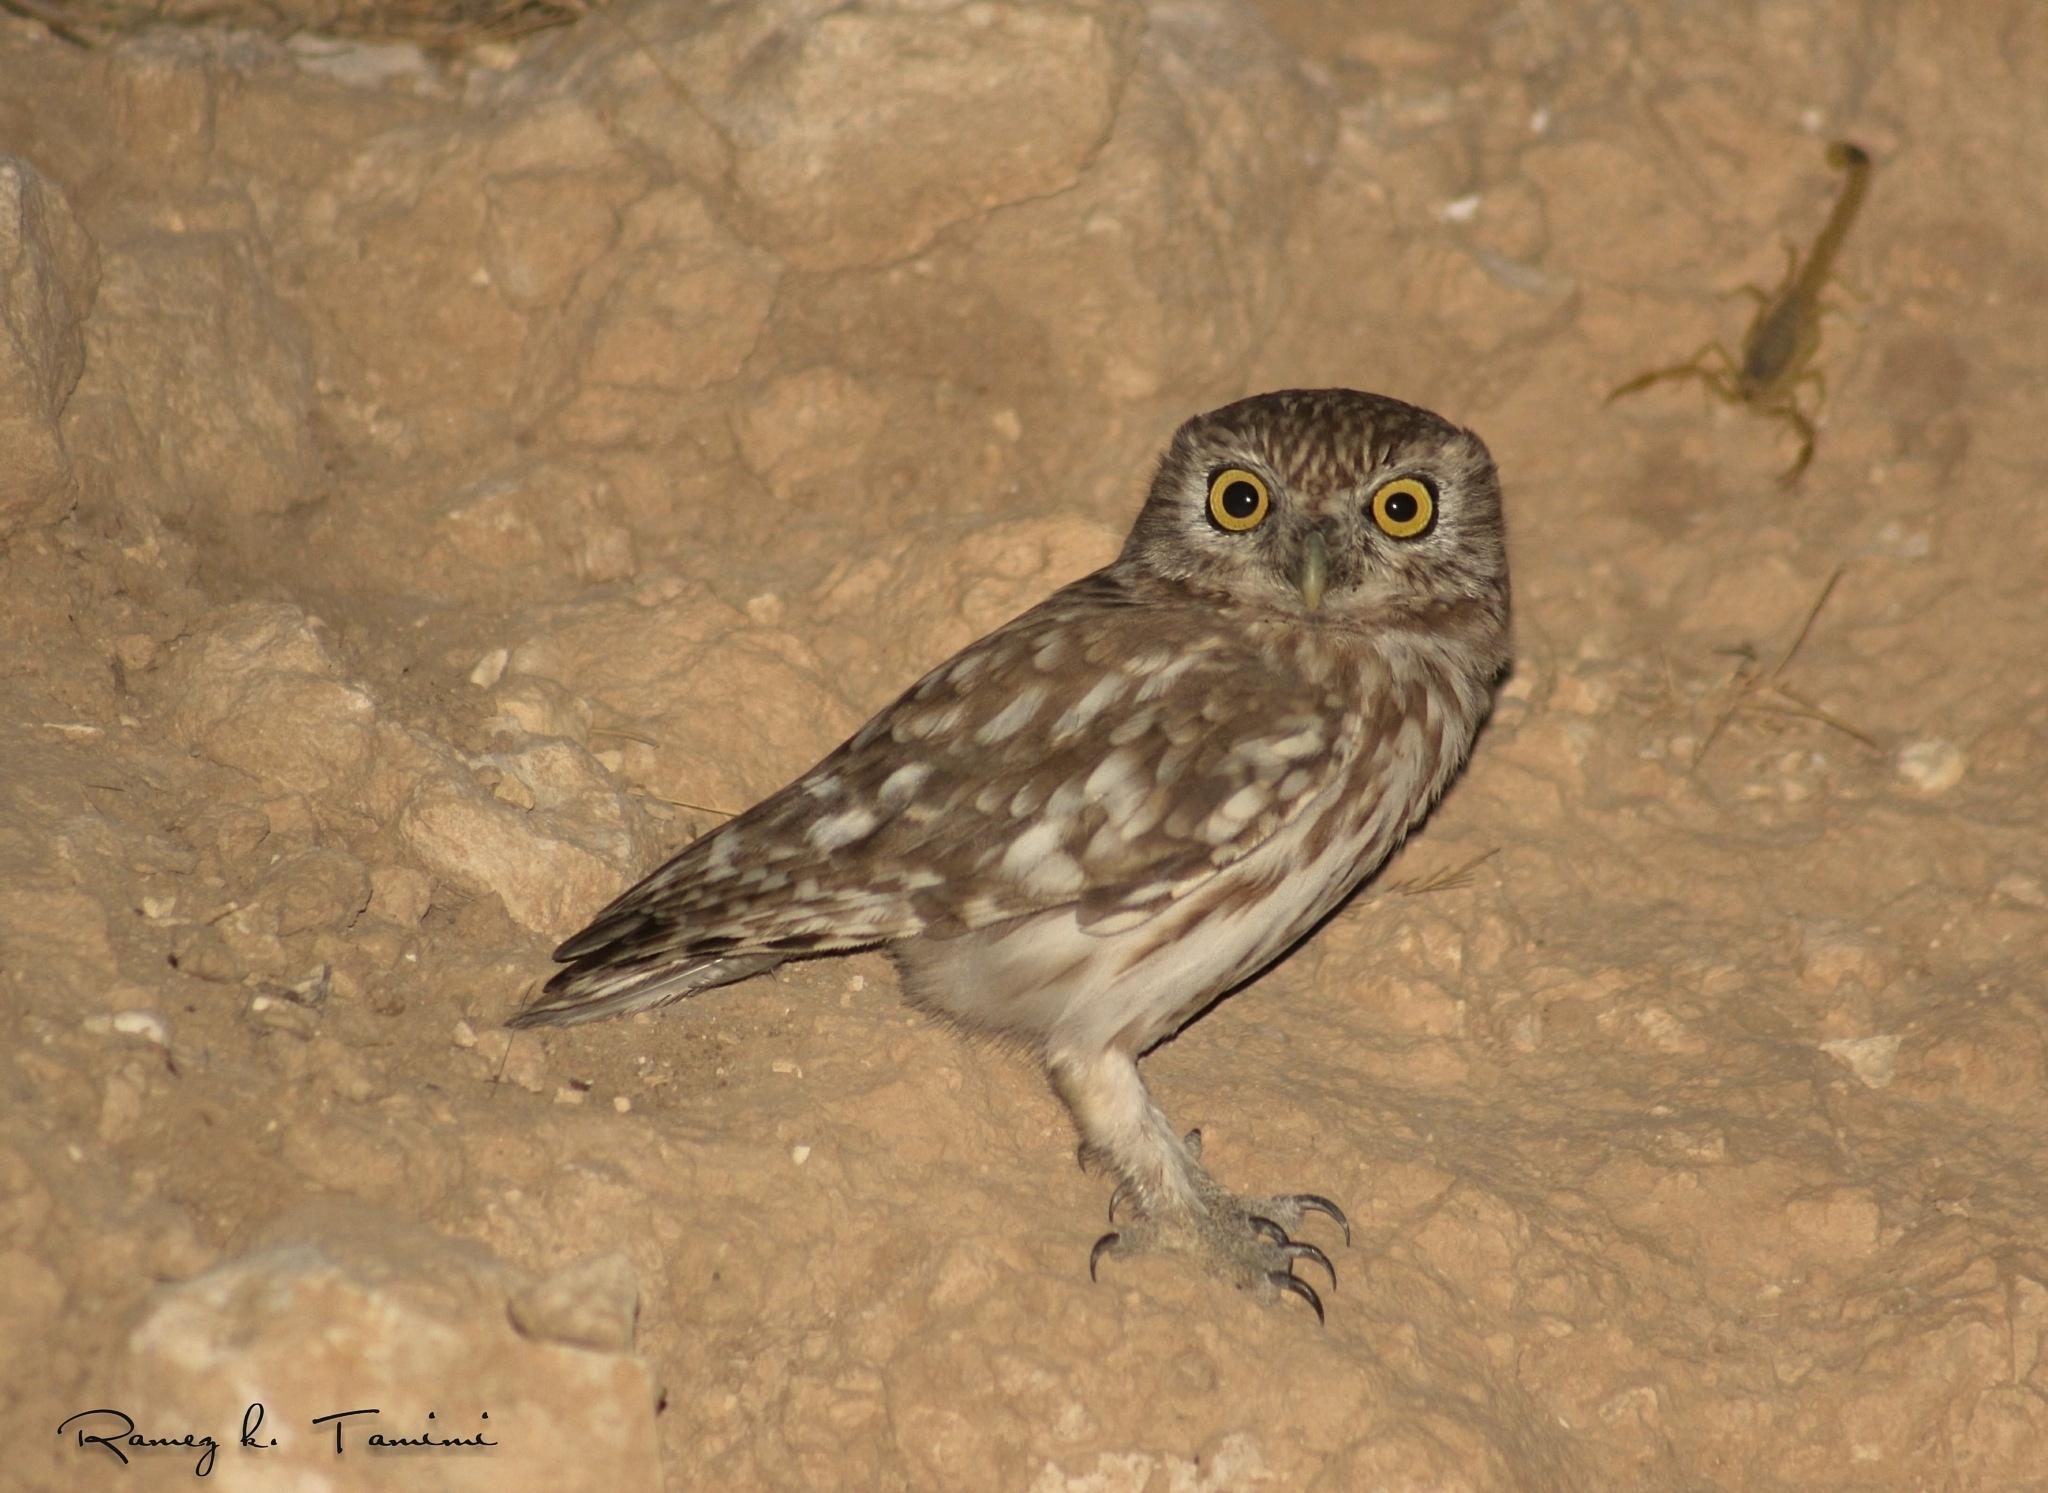 OWL and scorpion by Ramez k. Tamimi